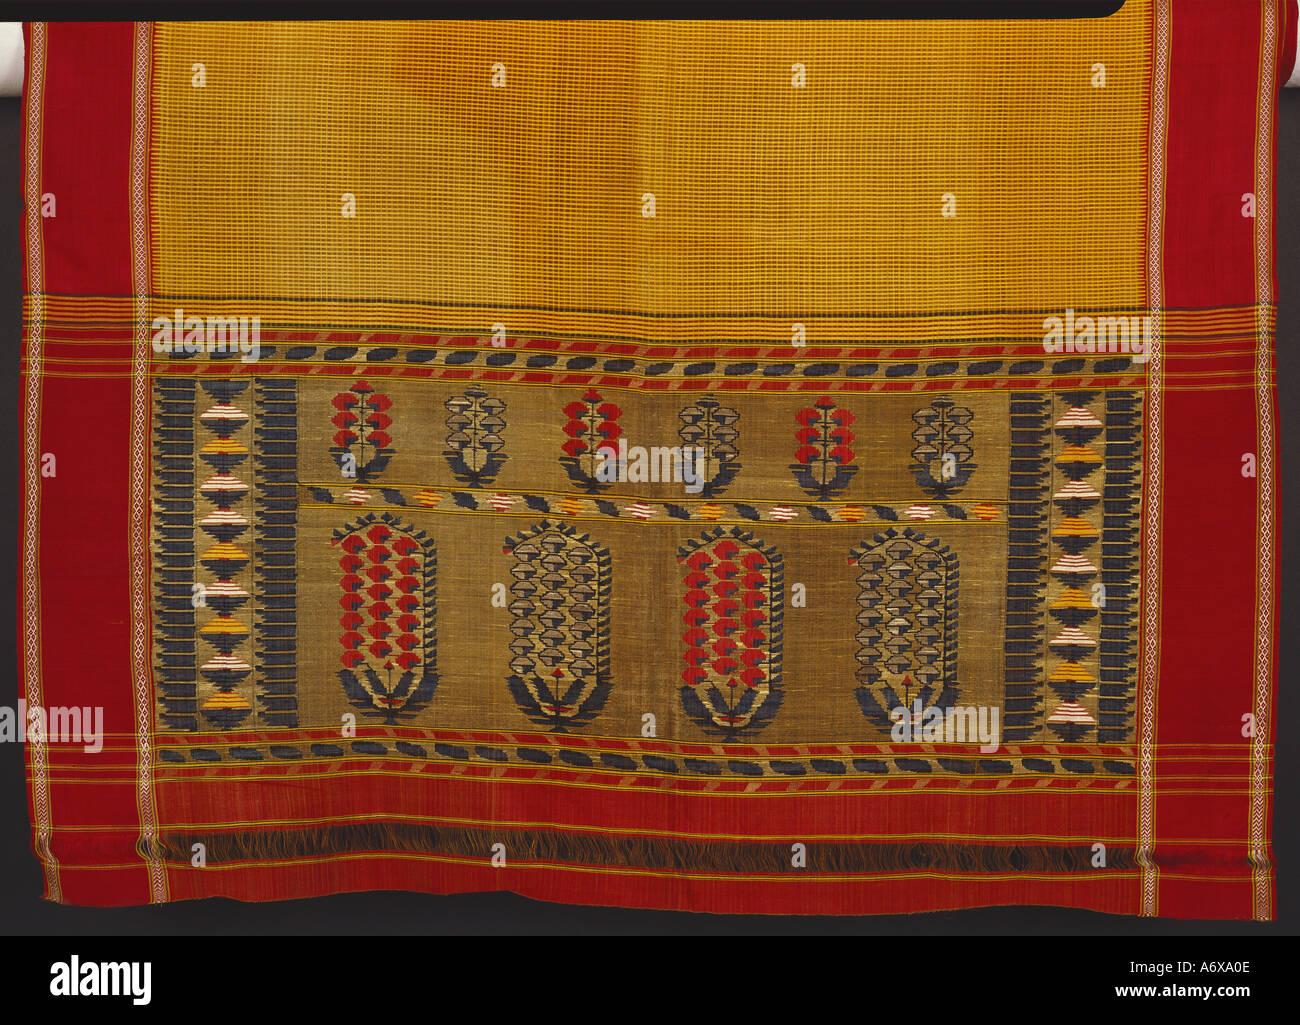 Sari. Tanjore (Thanjavur), Tamil Nadu, India meridionale, a metà del XIX secolo. Immagini Stock